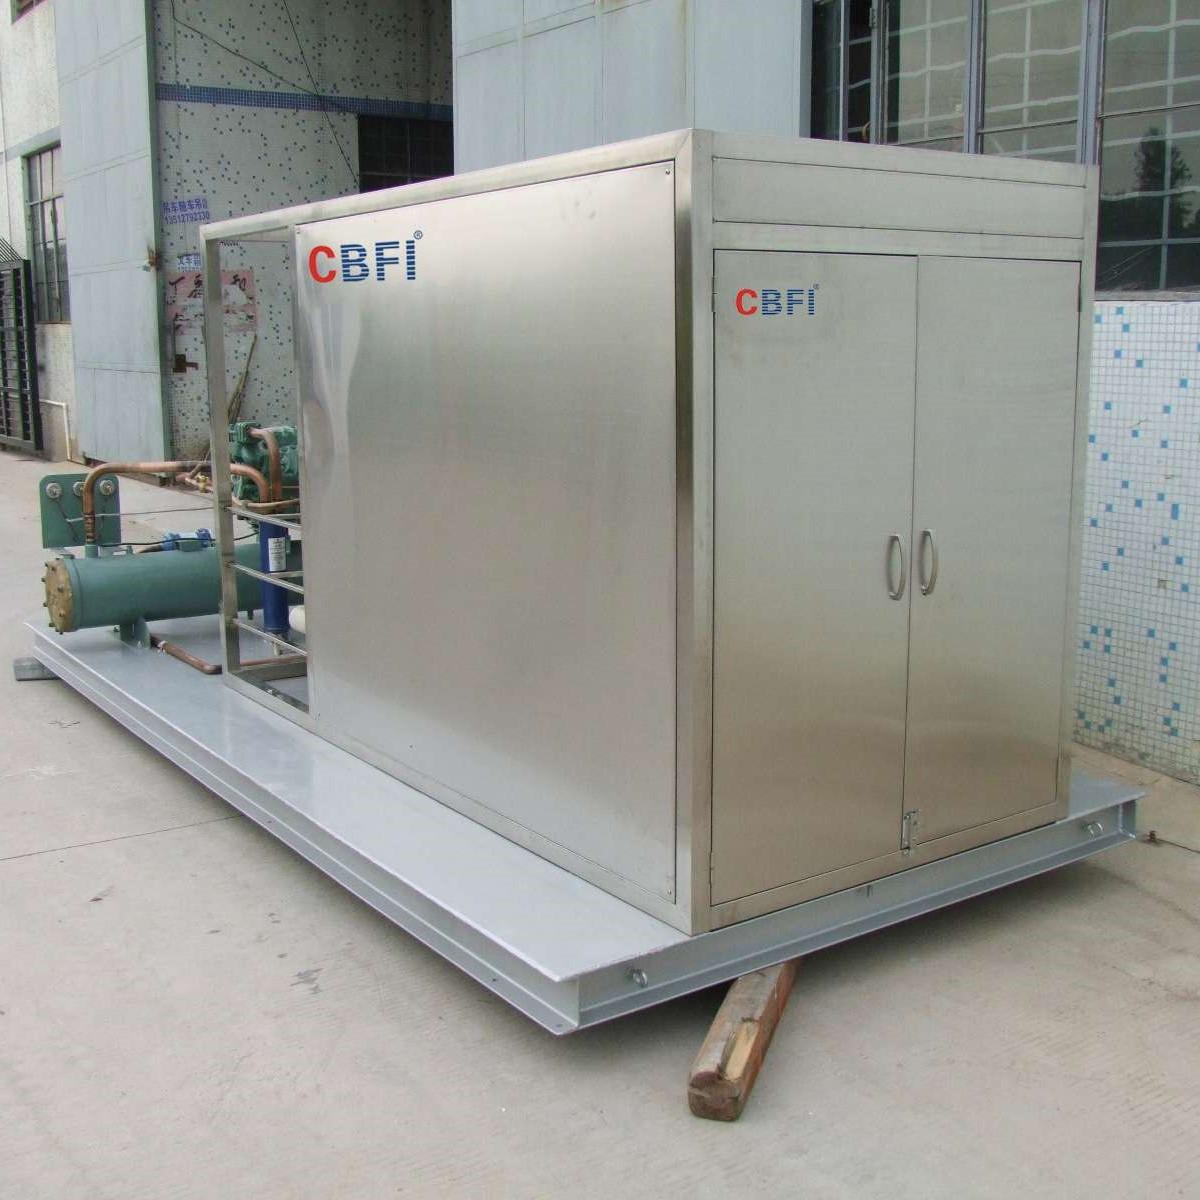 news-CBFI-CBFI-img-1